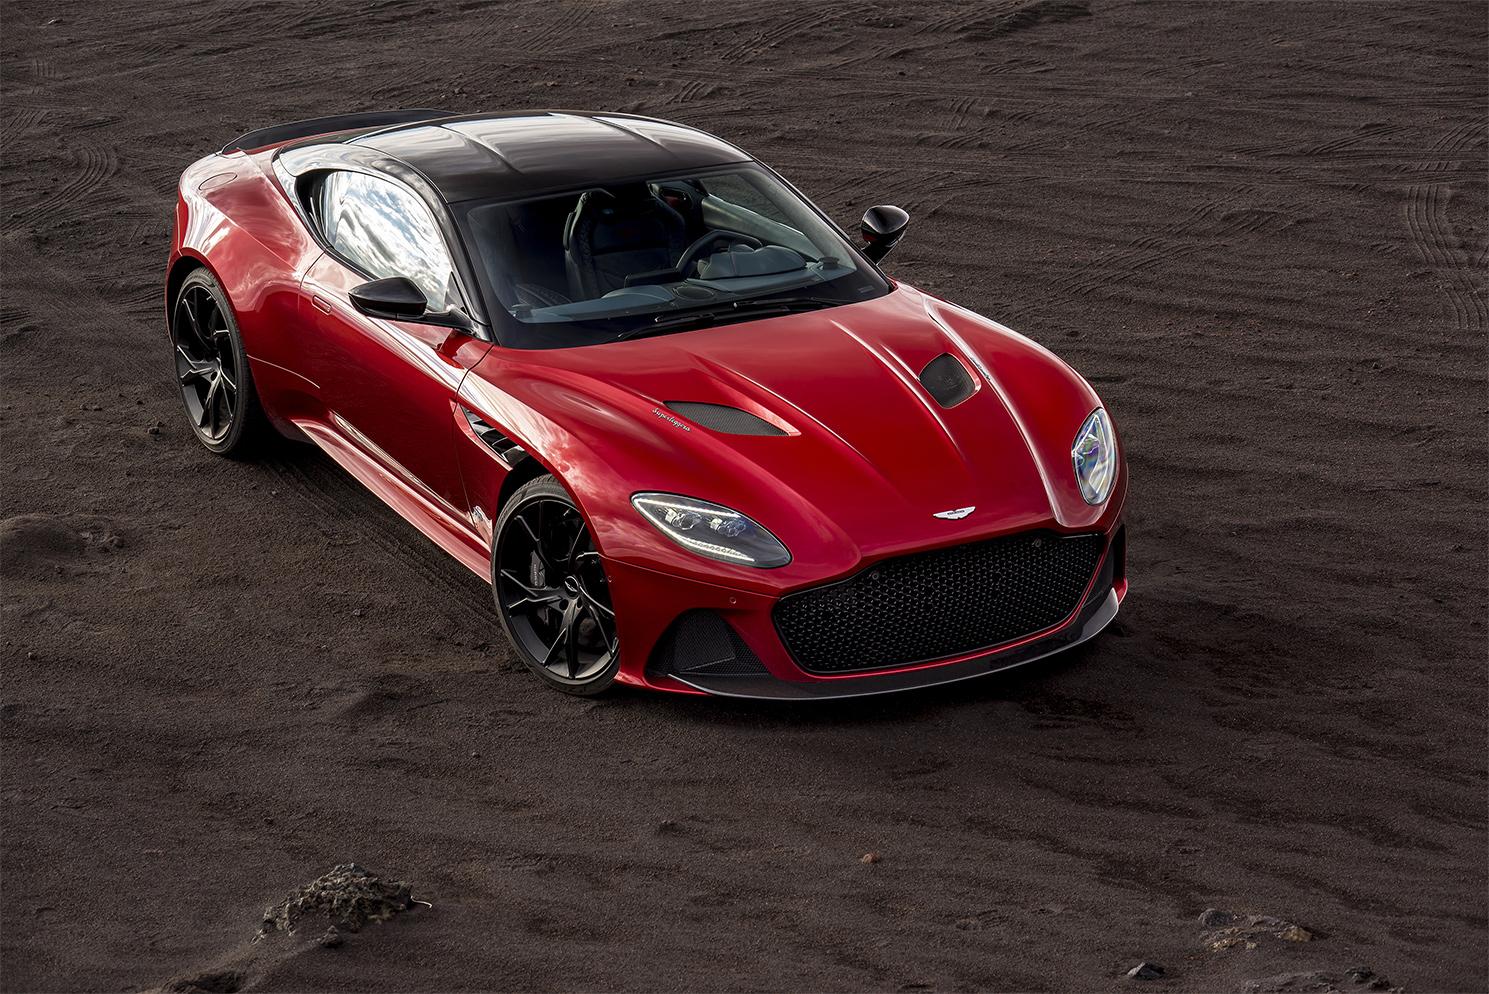 TrackWorthy - Aston Martin DBS Superleggera (12)